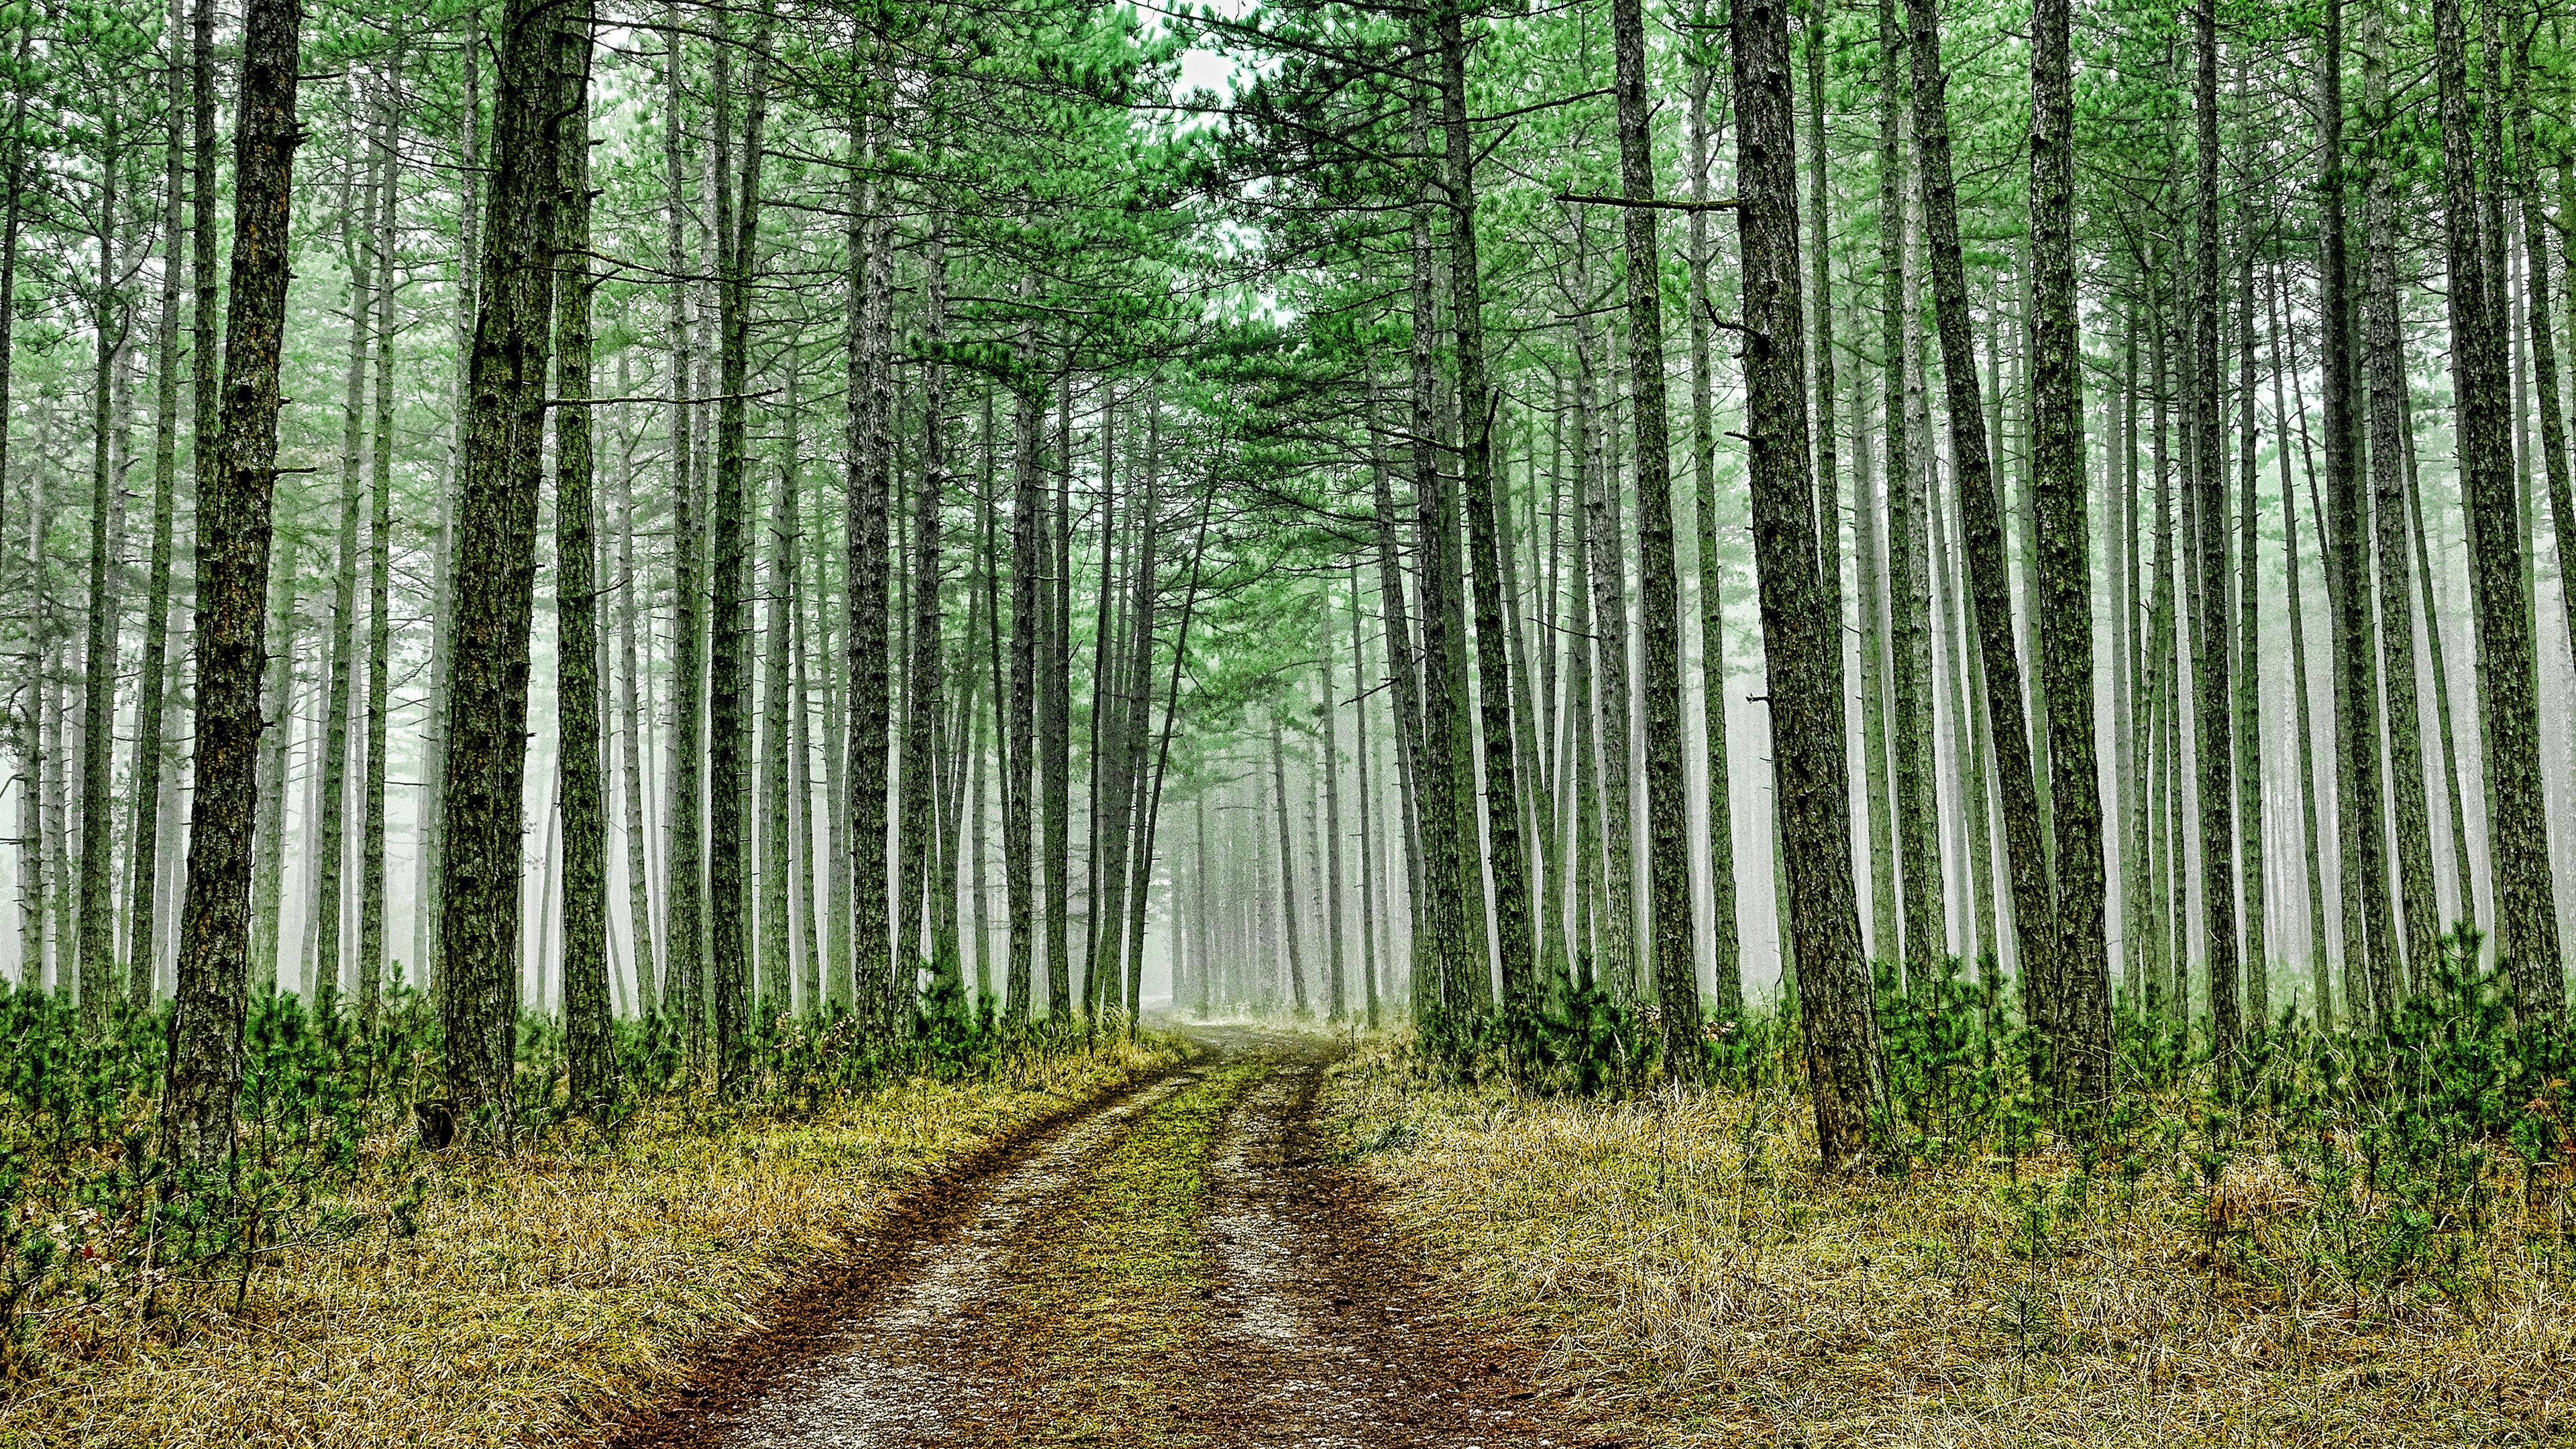 4k Green Forest Road Wallpaper Hd